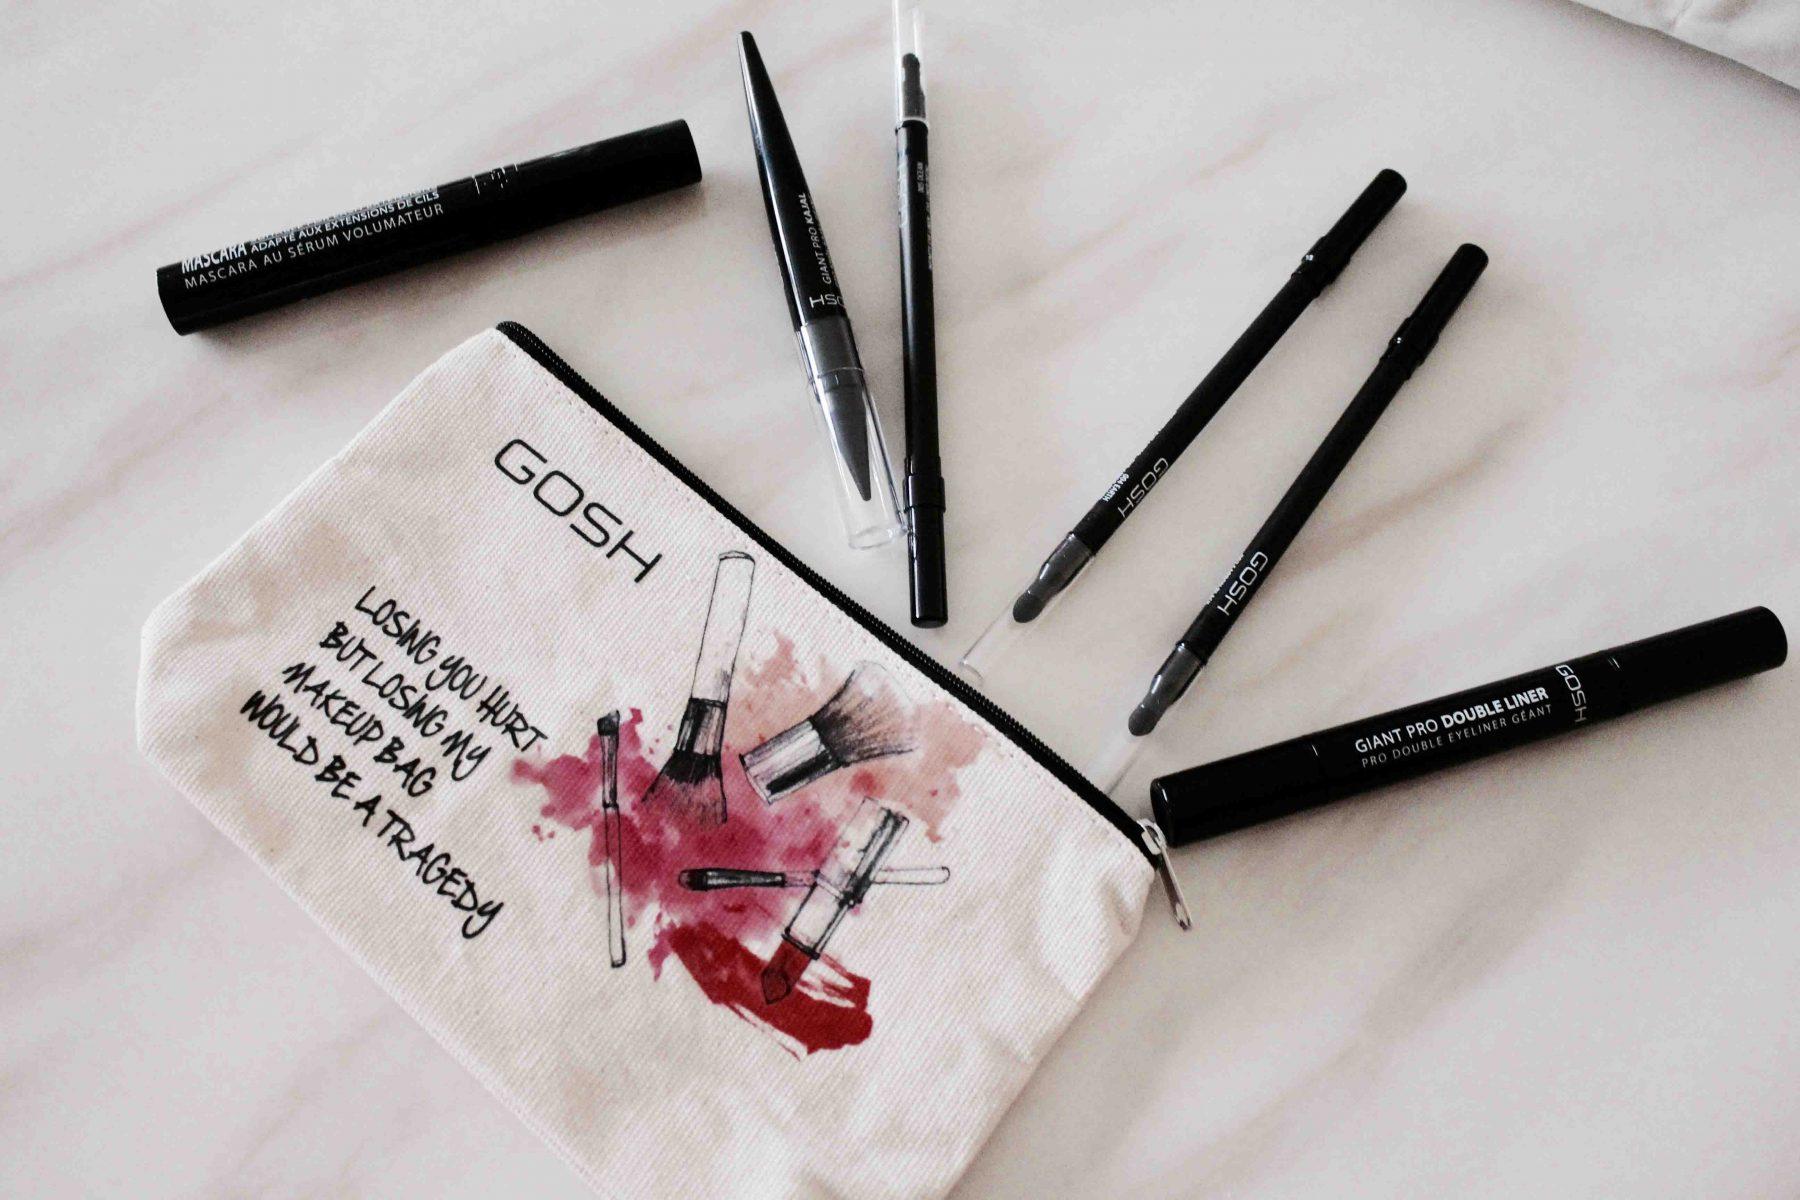 Eye makeup bag